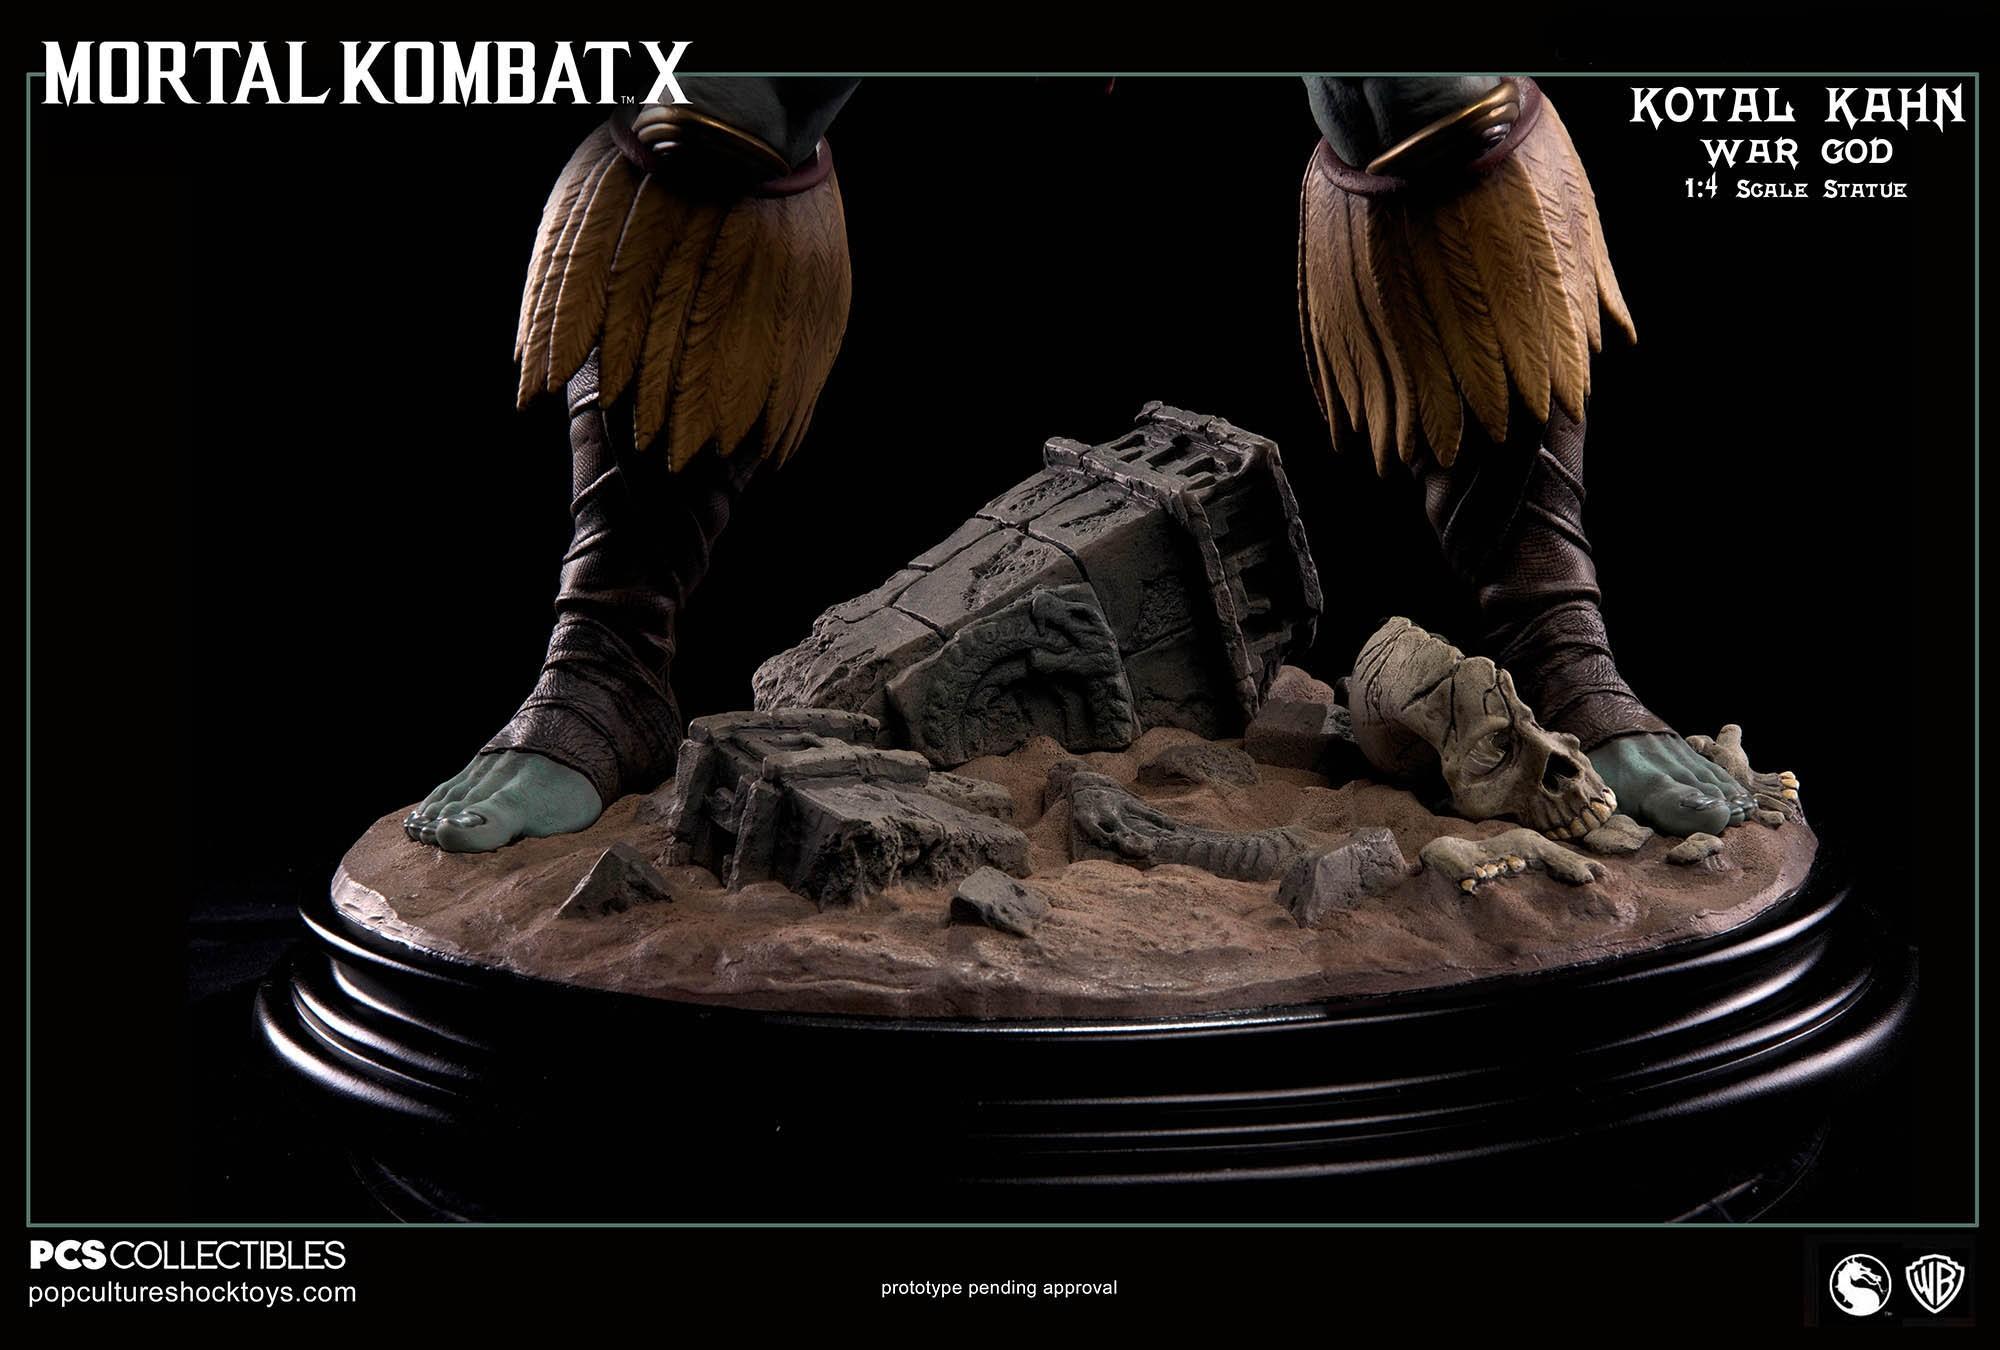 [Pop Culture Shock] Mortal Kombat X: Kotal Kahn 1:4 scale PCS-Kotal-Kahn-War-God-014